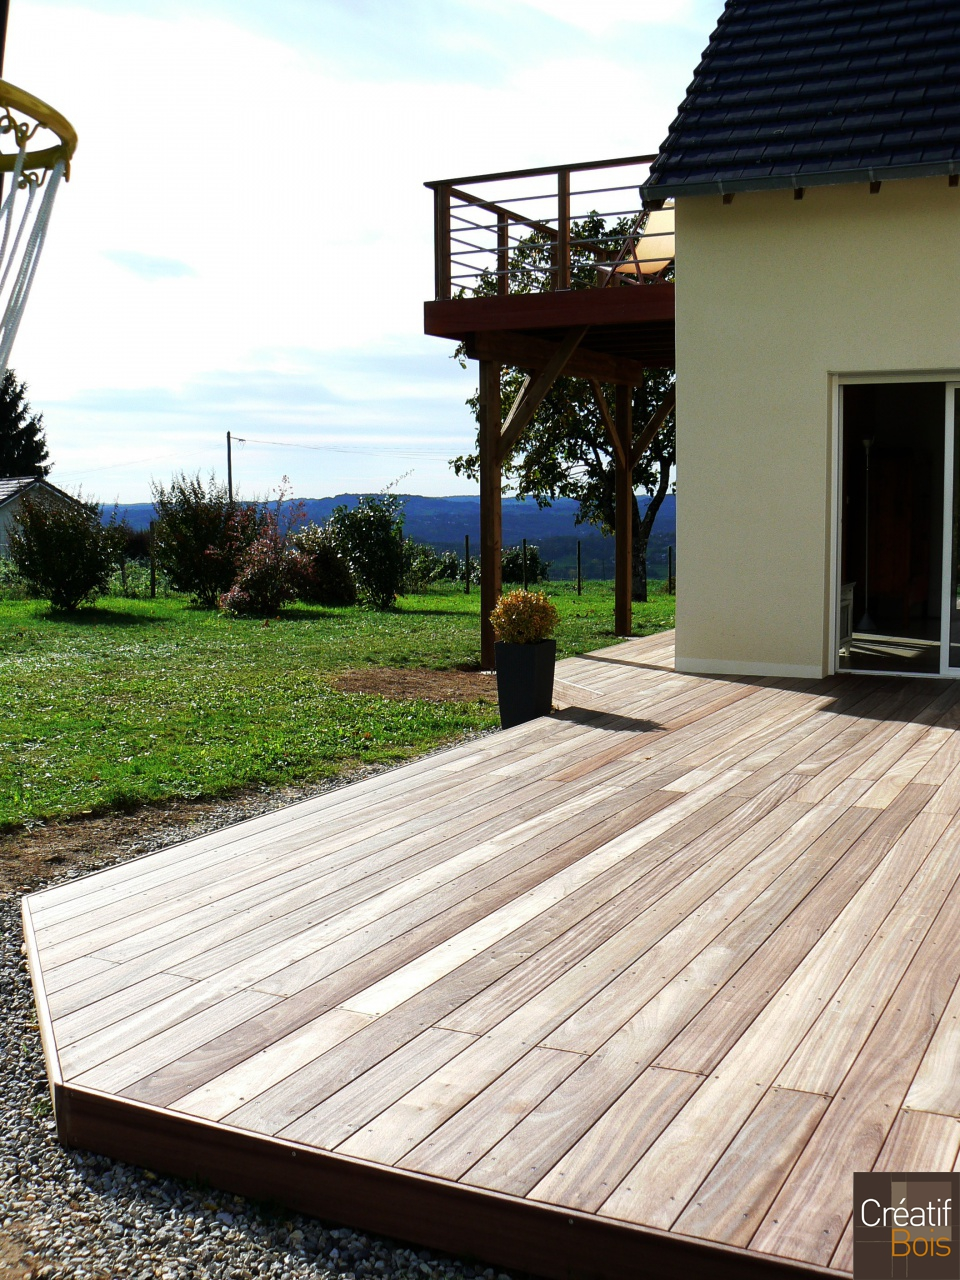 terrasse en padouk allassac corr ze 19 r alisations terrasses galerie cr atif bois. Black Bedroom Furniture Sets. Home Design Ideas